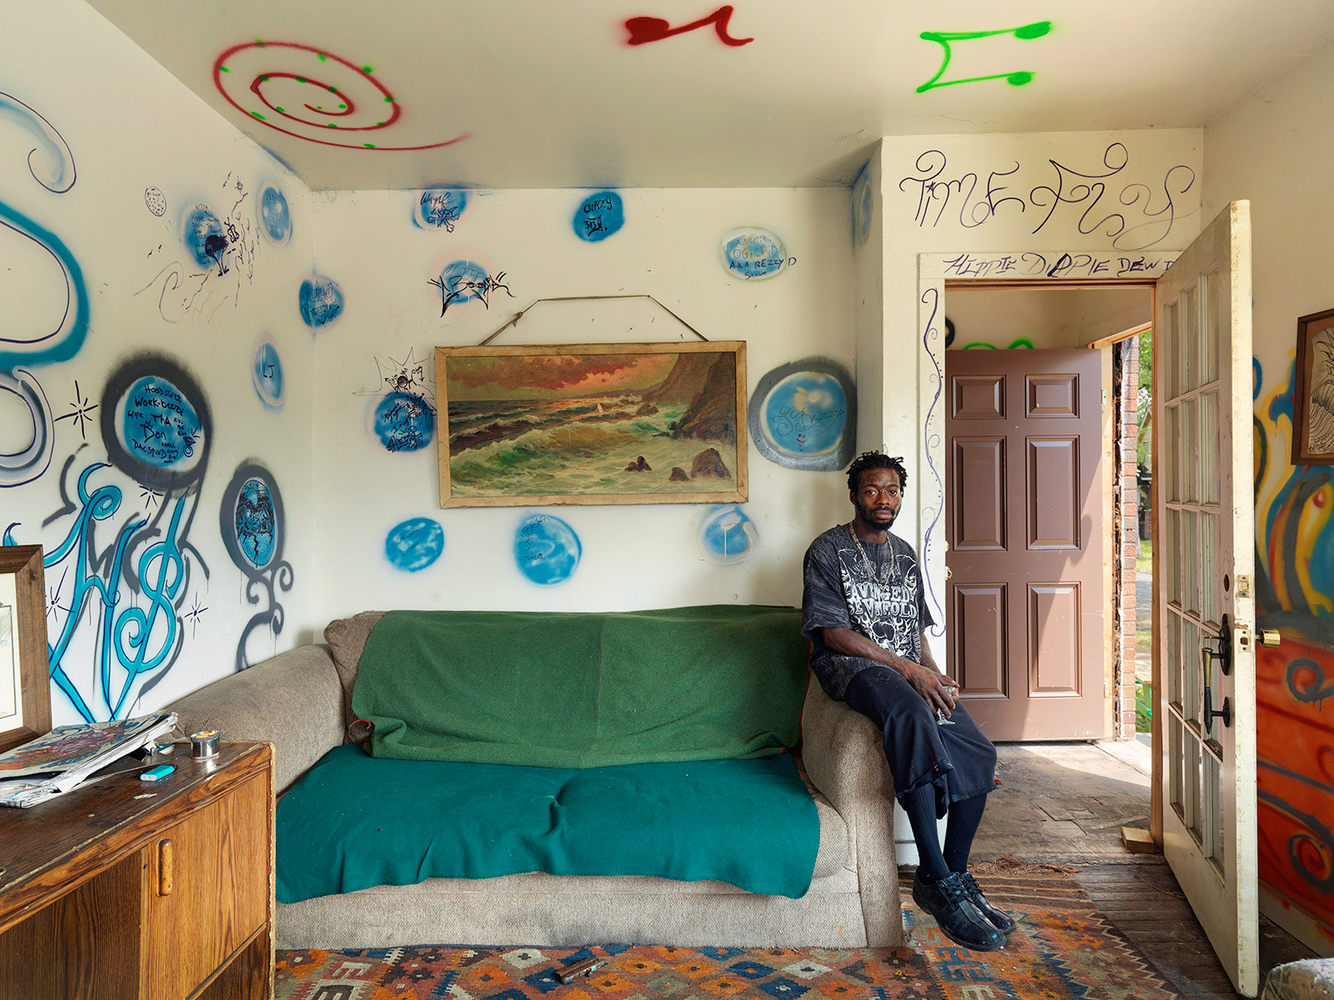 Beezy at Home, Goldengate Street Resident, Detroit 2012